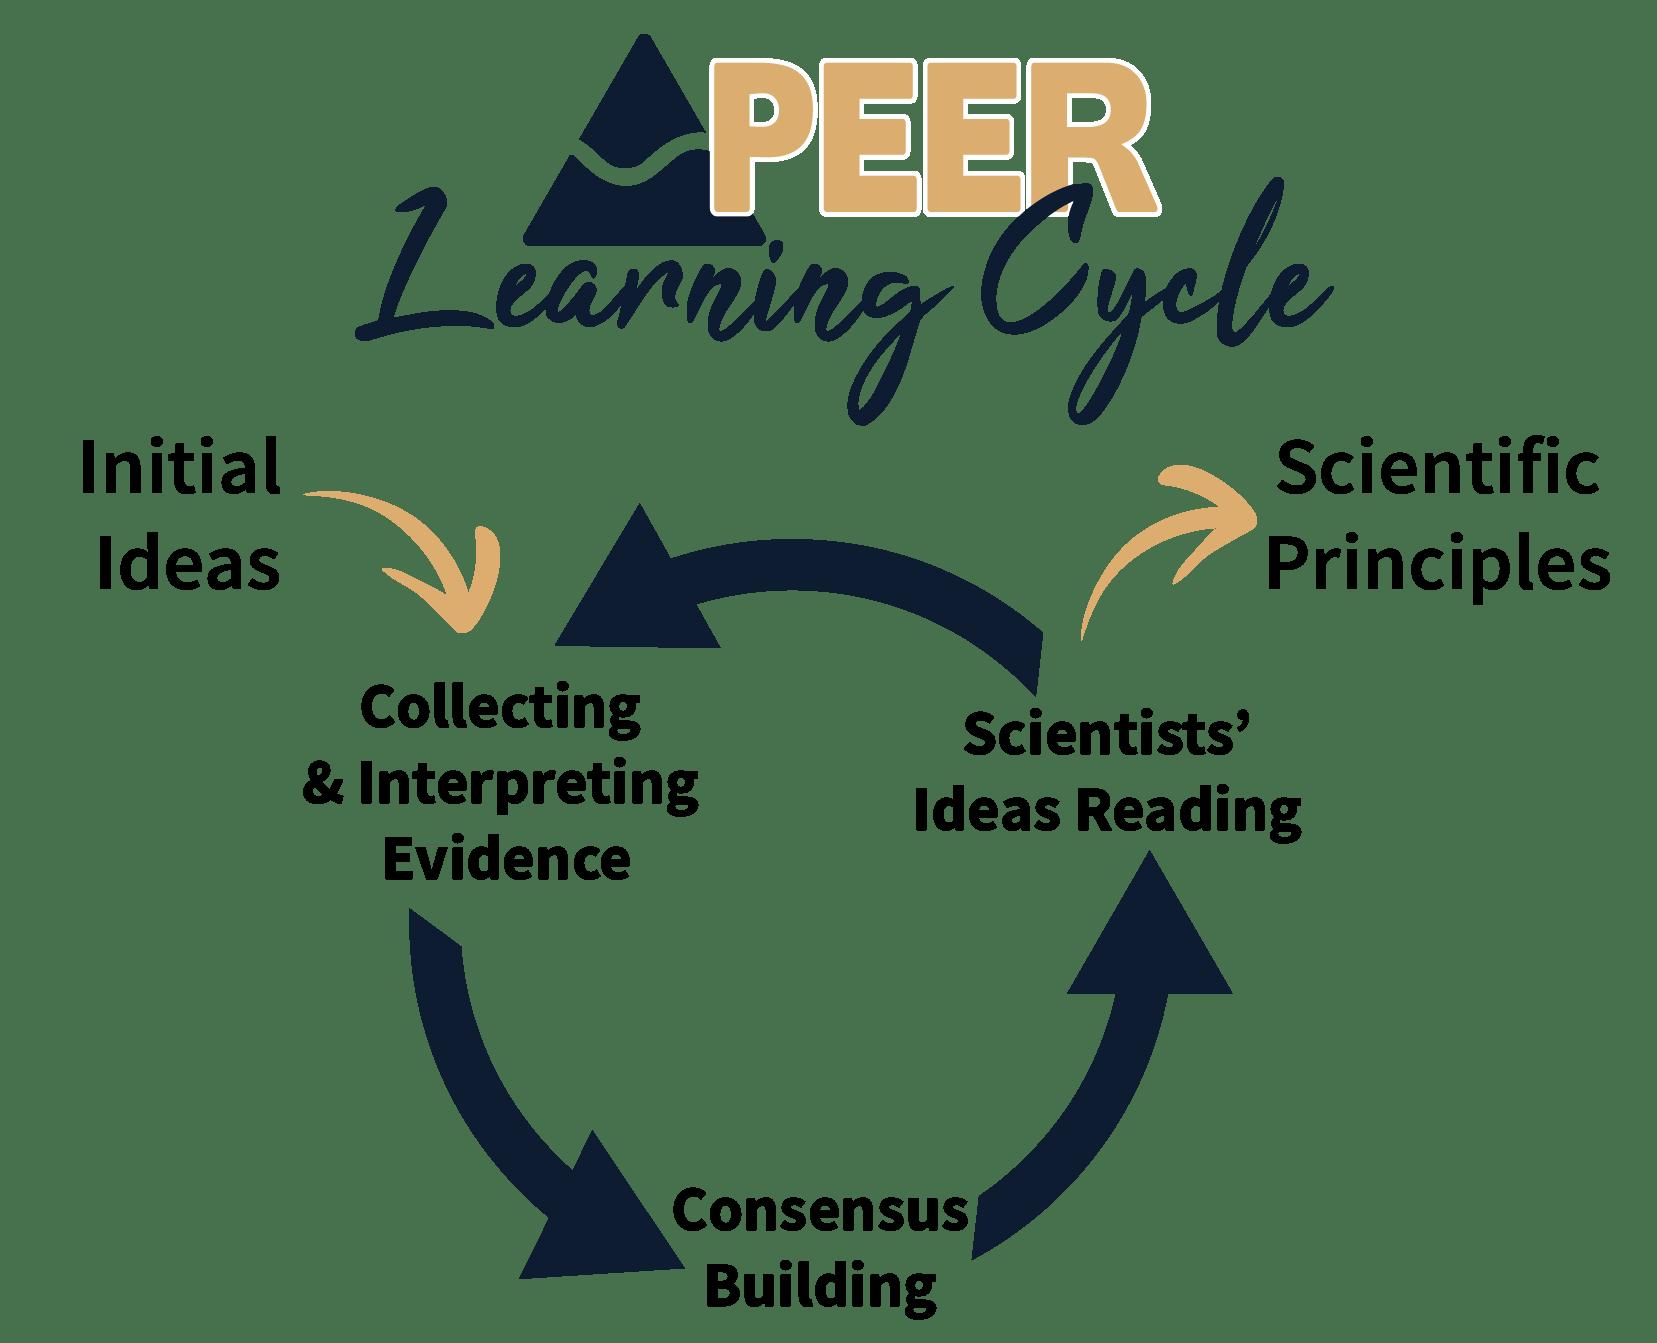 Transforming Classrooms - Physics Through Evidence